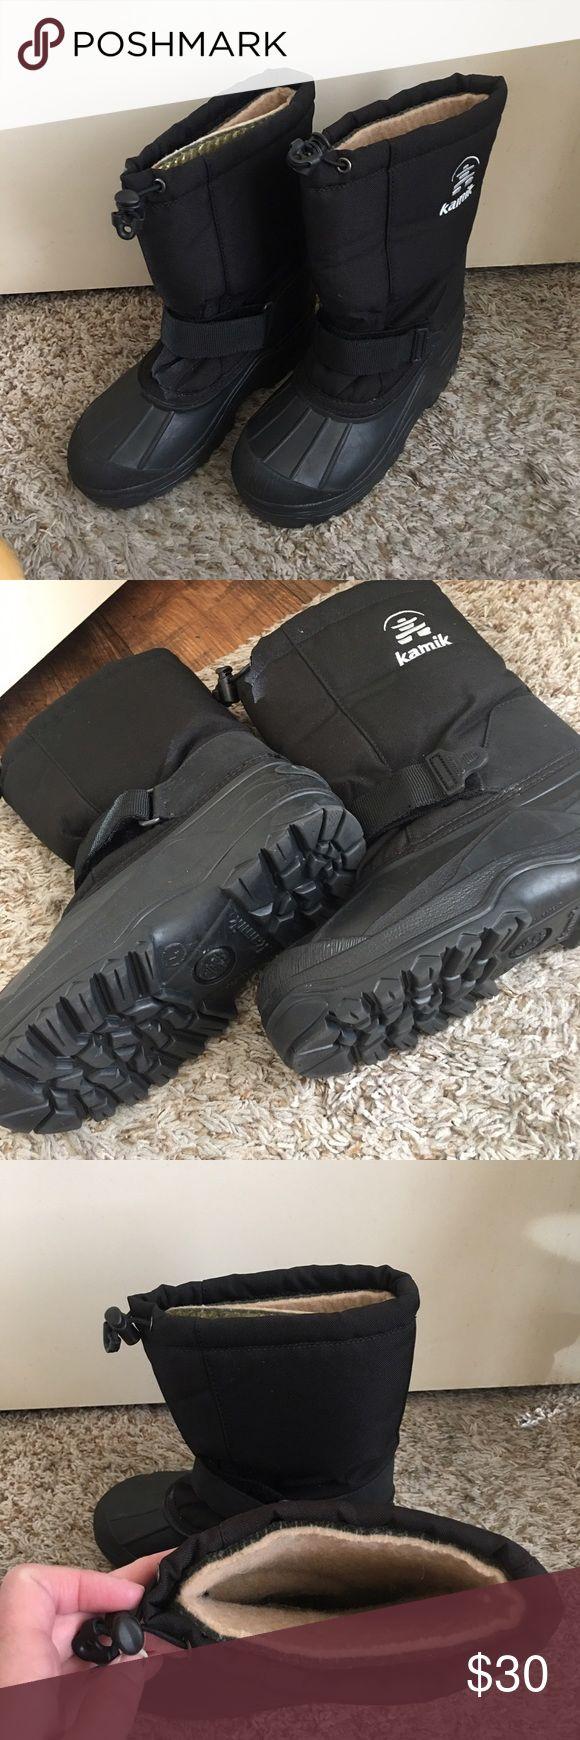 Kamik winter snow boots Kamik black winter snow boots Kamik Shoes Rain & Snow Boots